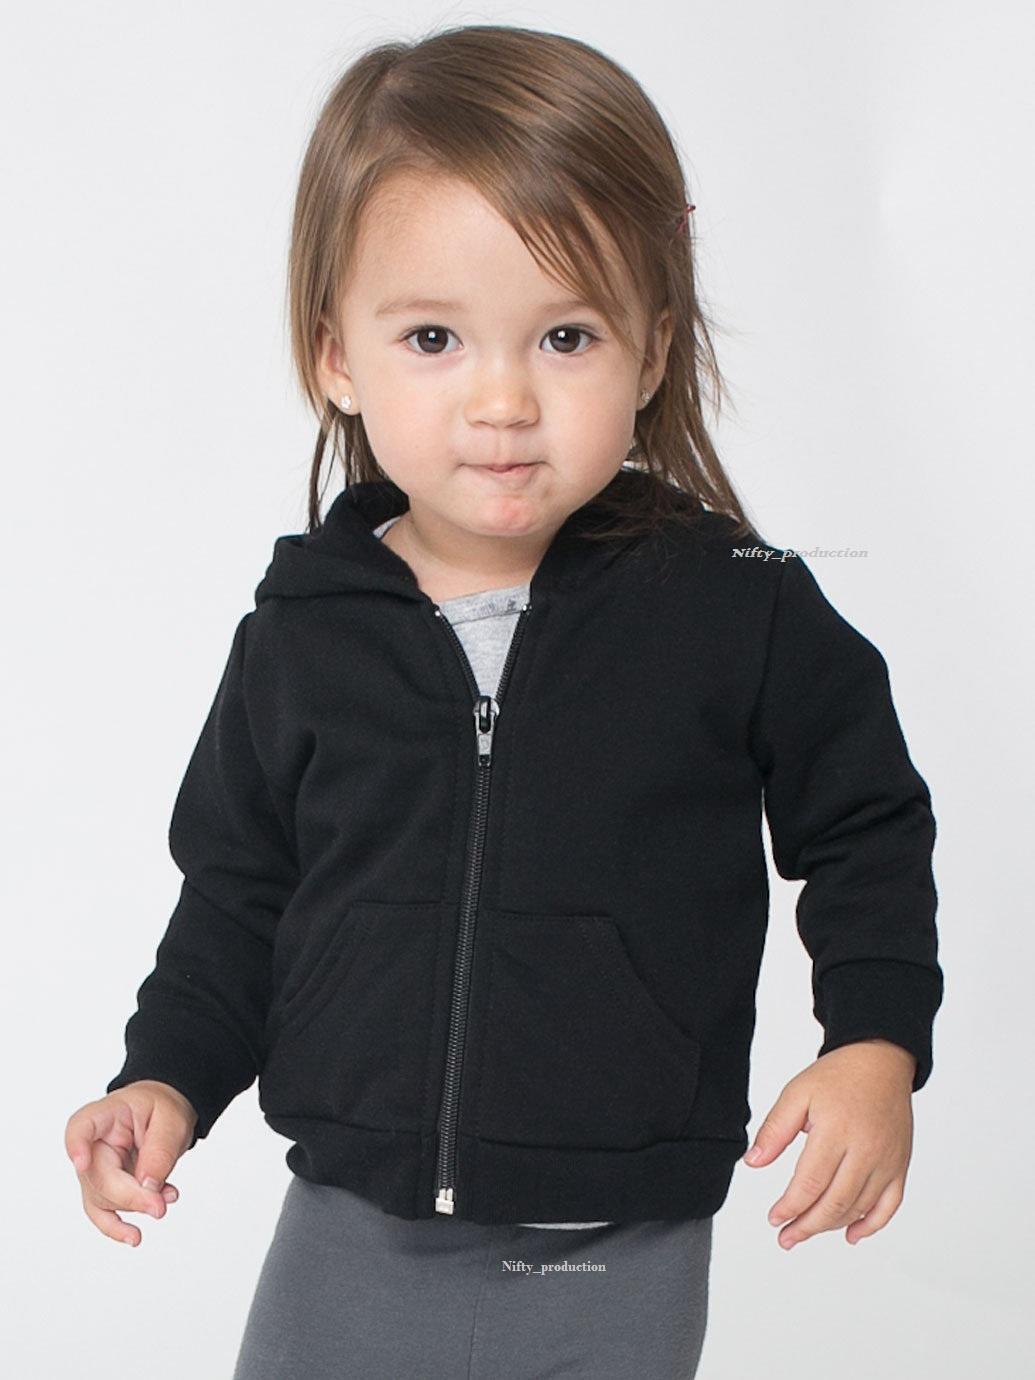 Kelebihan Jaket Pria Anak Merah Zipper Nifty21 Terkini Daftar Sweater Hoodie Laki Wanita Hitam